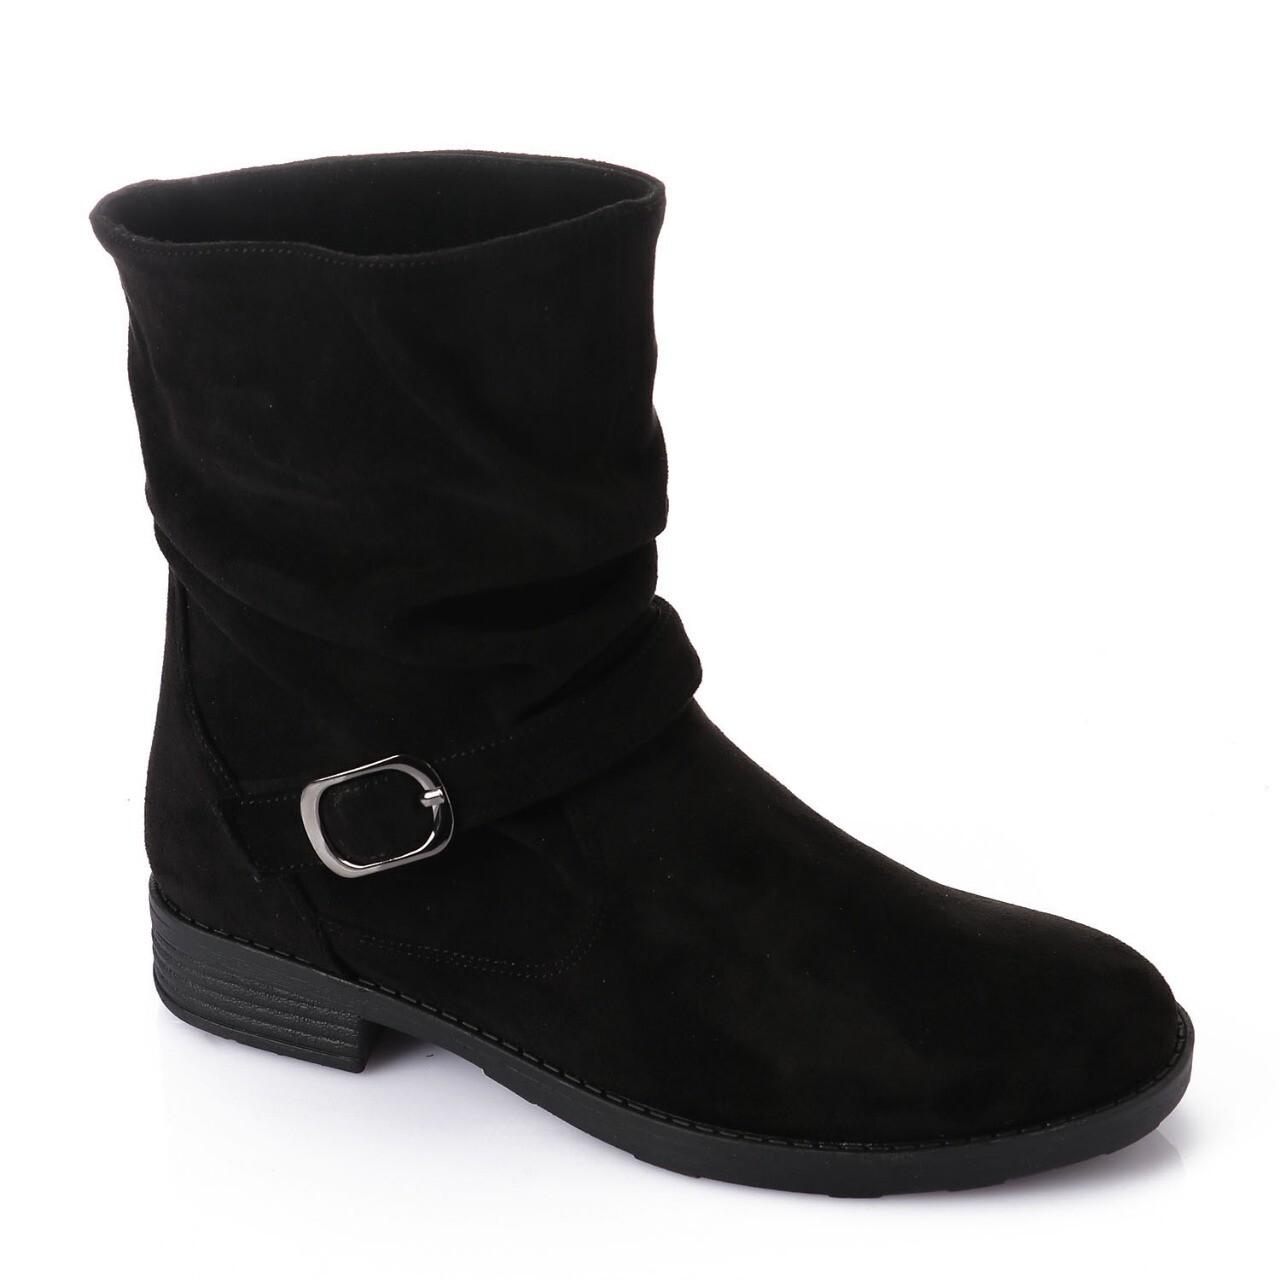 3733 Half Boot - Black SU